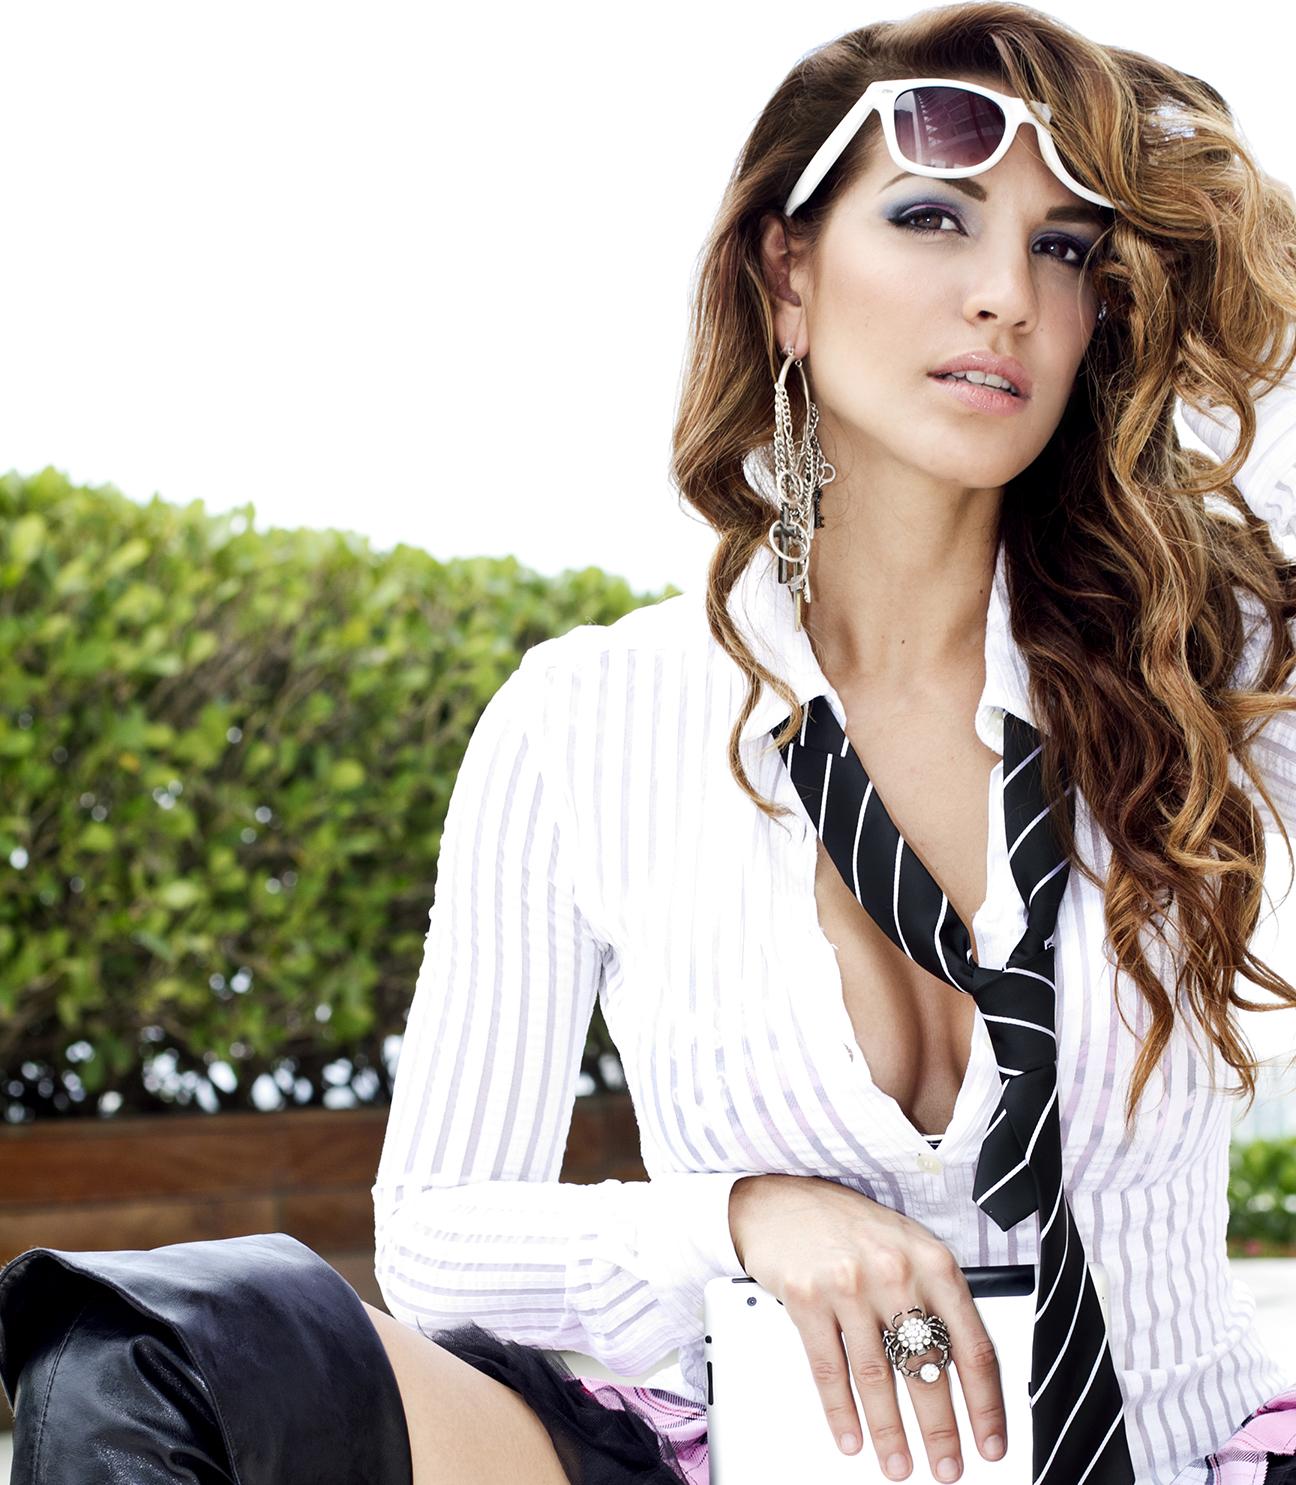 Ana ochoa photo la fashion celebrity headshot photographer for Chaise candie life